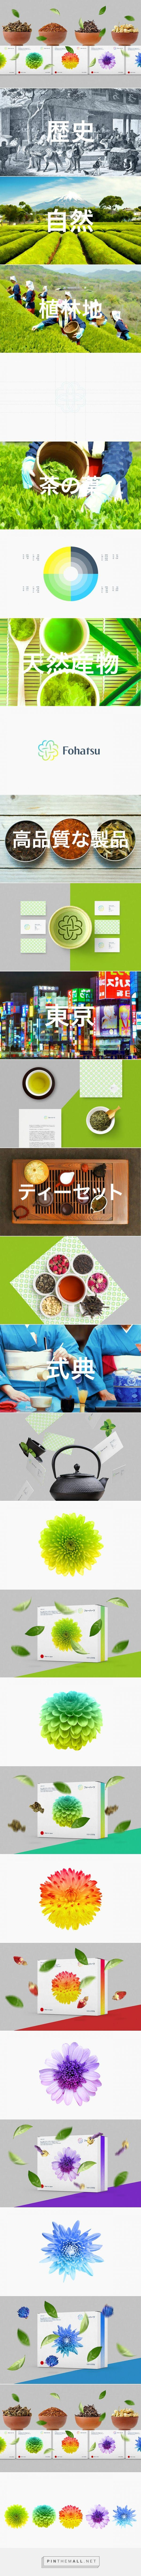 Fohatsu tea packaging designed by Ramin Nasibov - http://www.packagingoftheworld.com/2015/12/fohatsu.html